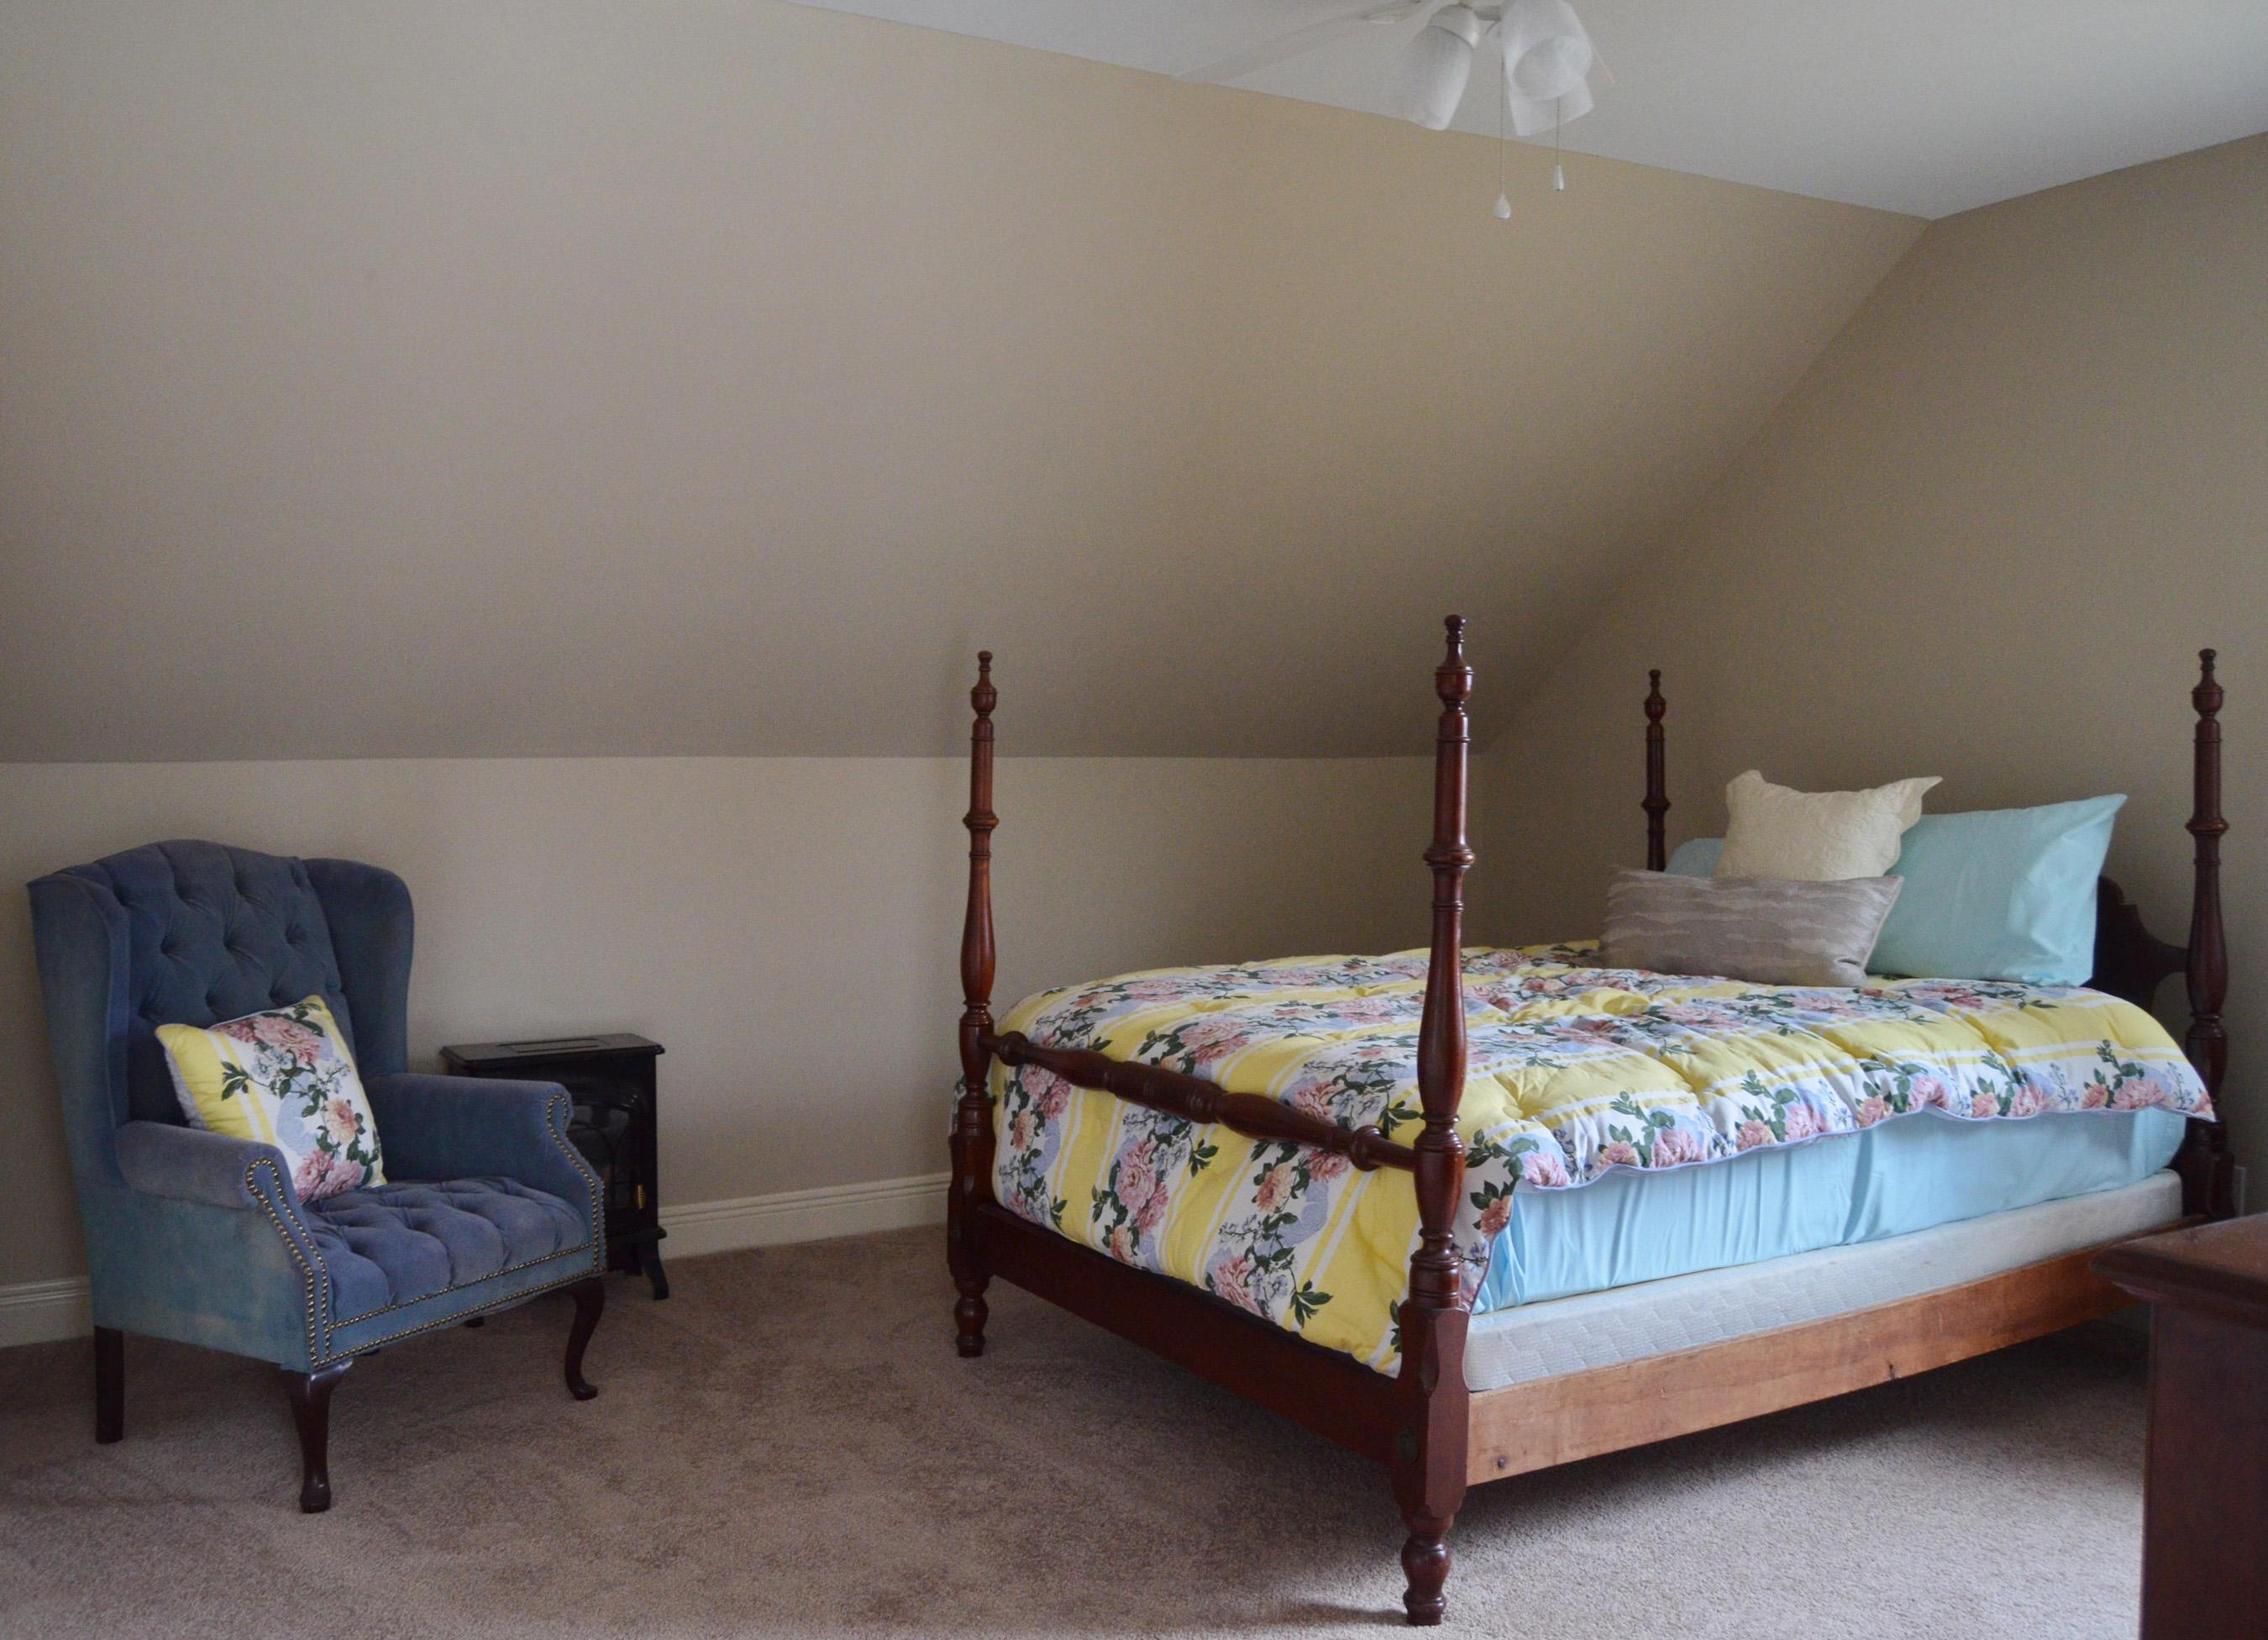 19-Ul Bed Room P1